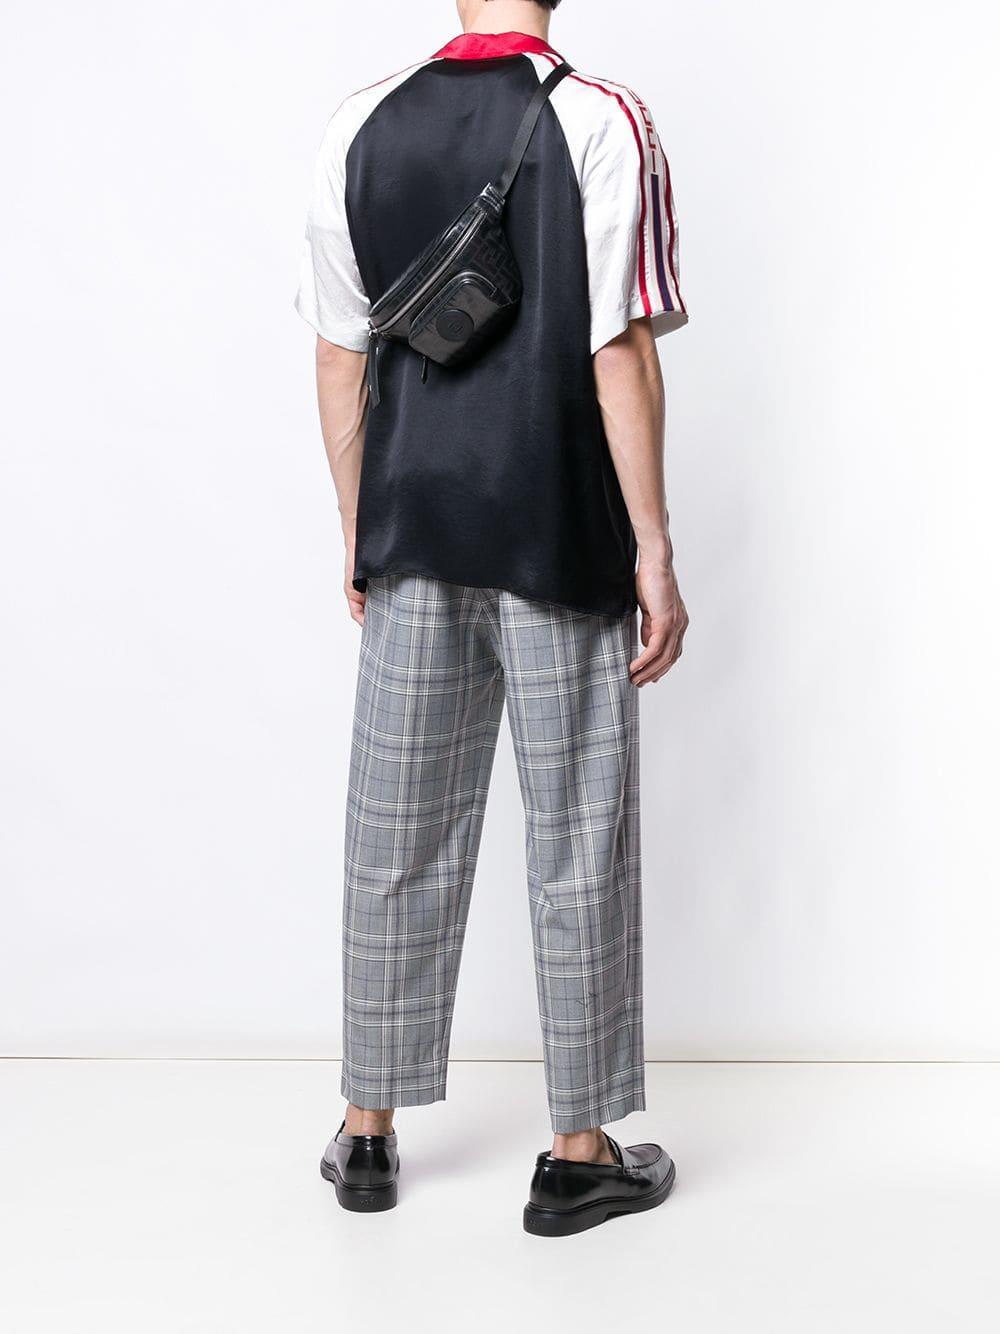 910b26b19db7 Fendi - Black Ff Belt Bag for Men - Lyst. View fullscreen